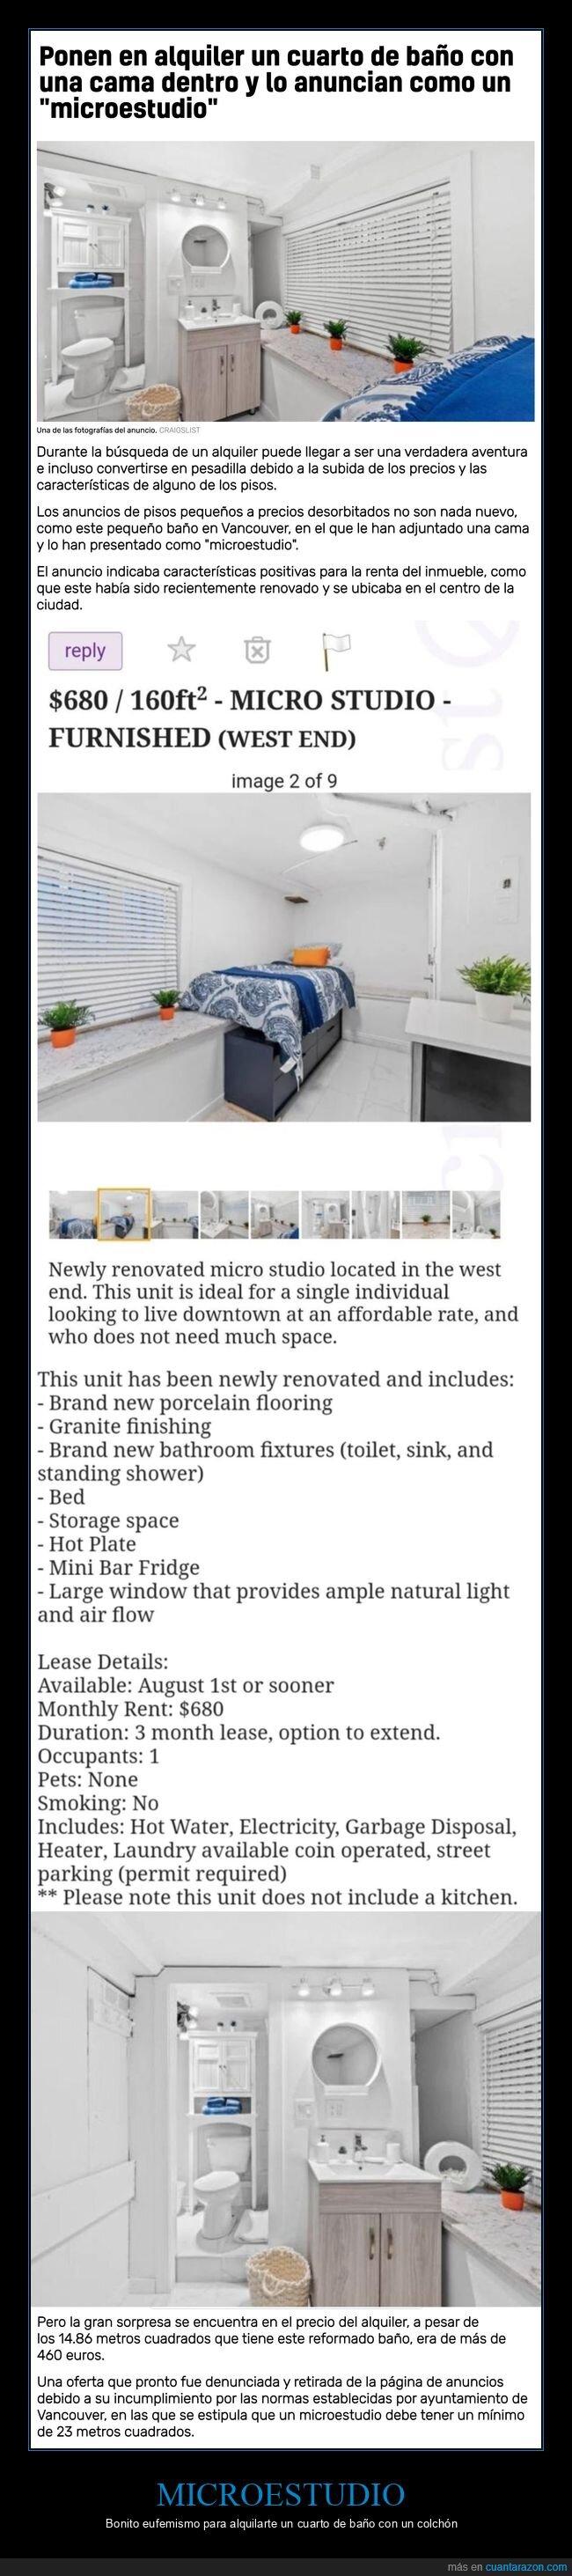 alquiler,cuarto de baño,microestudio